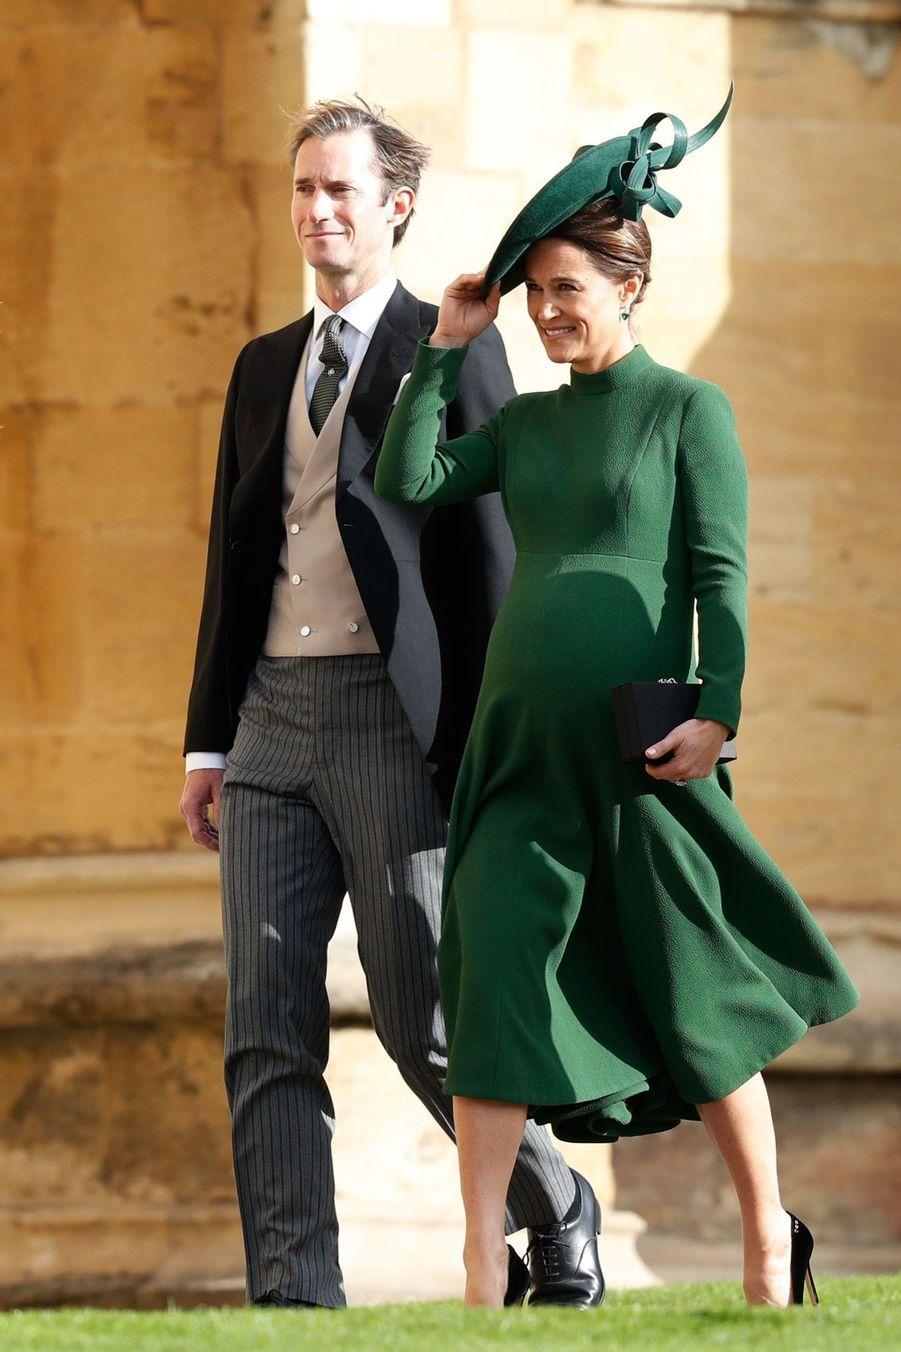 Pippa Middleton Très Enceinte Au Mariage De La Princesse Eugenie D'York ( 9